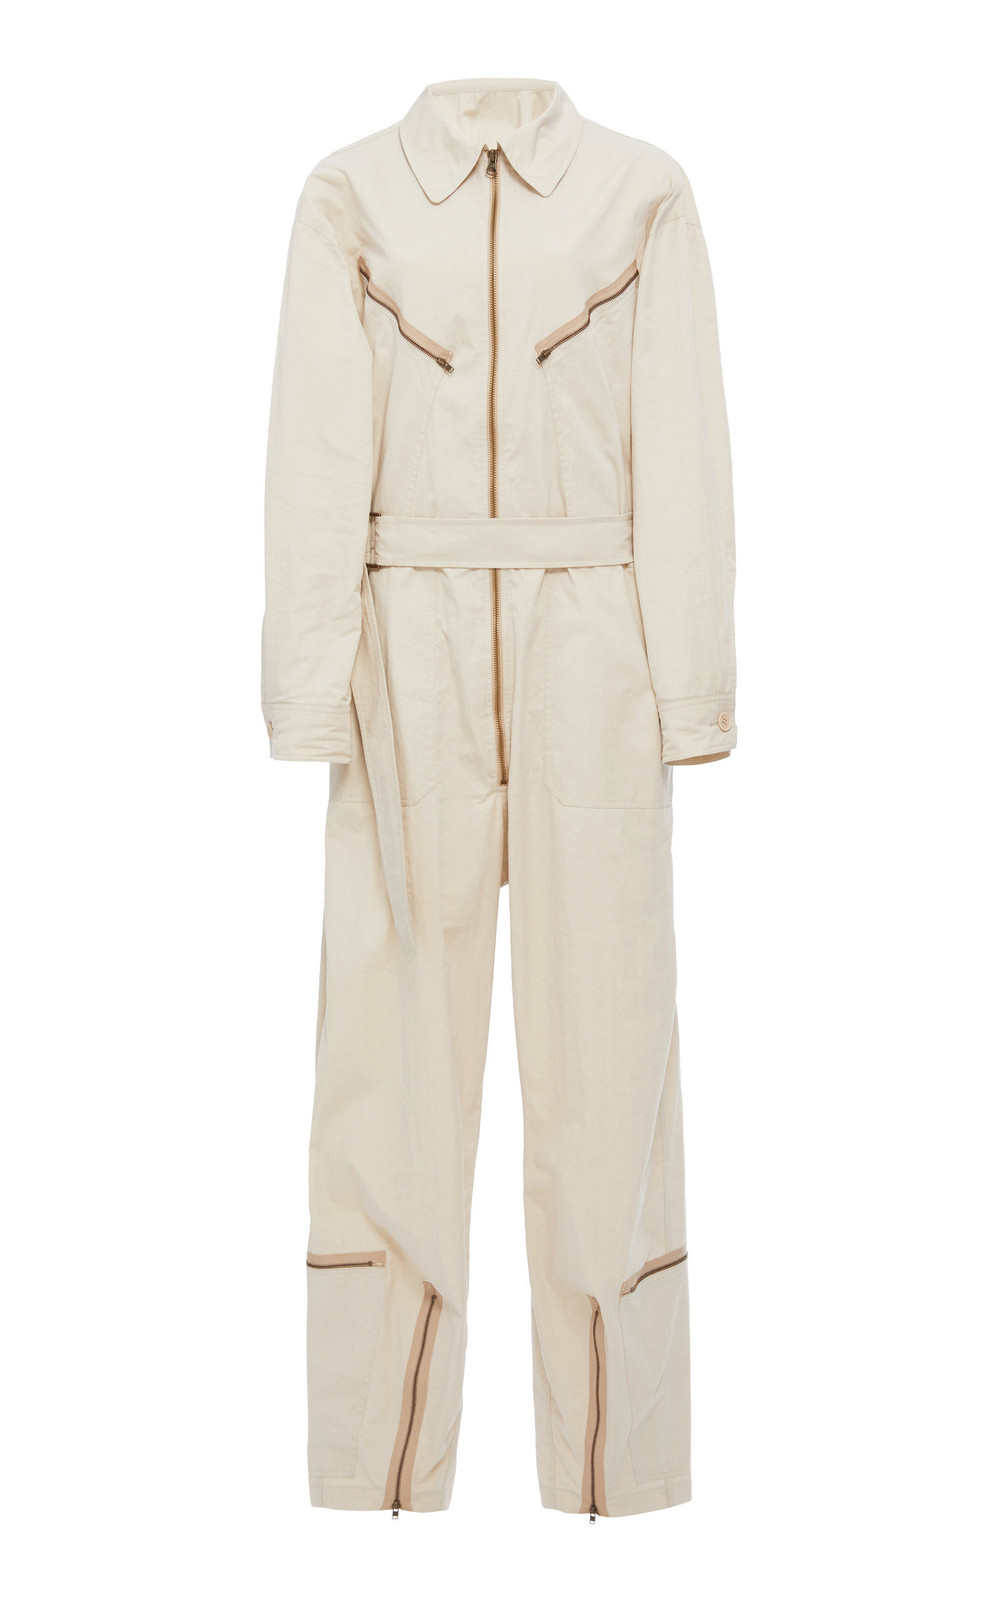 Tre by Natalie Ratabesi Pigalle Zippered Wide-Leg Cotton-Poplin Jumpsuit in neutral